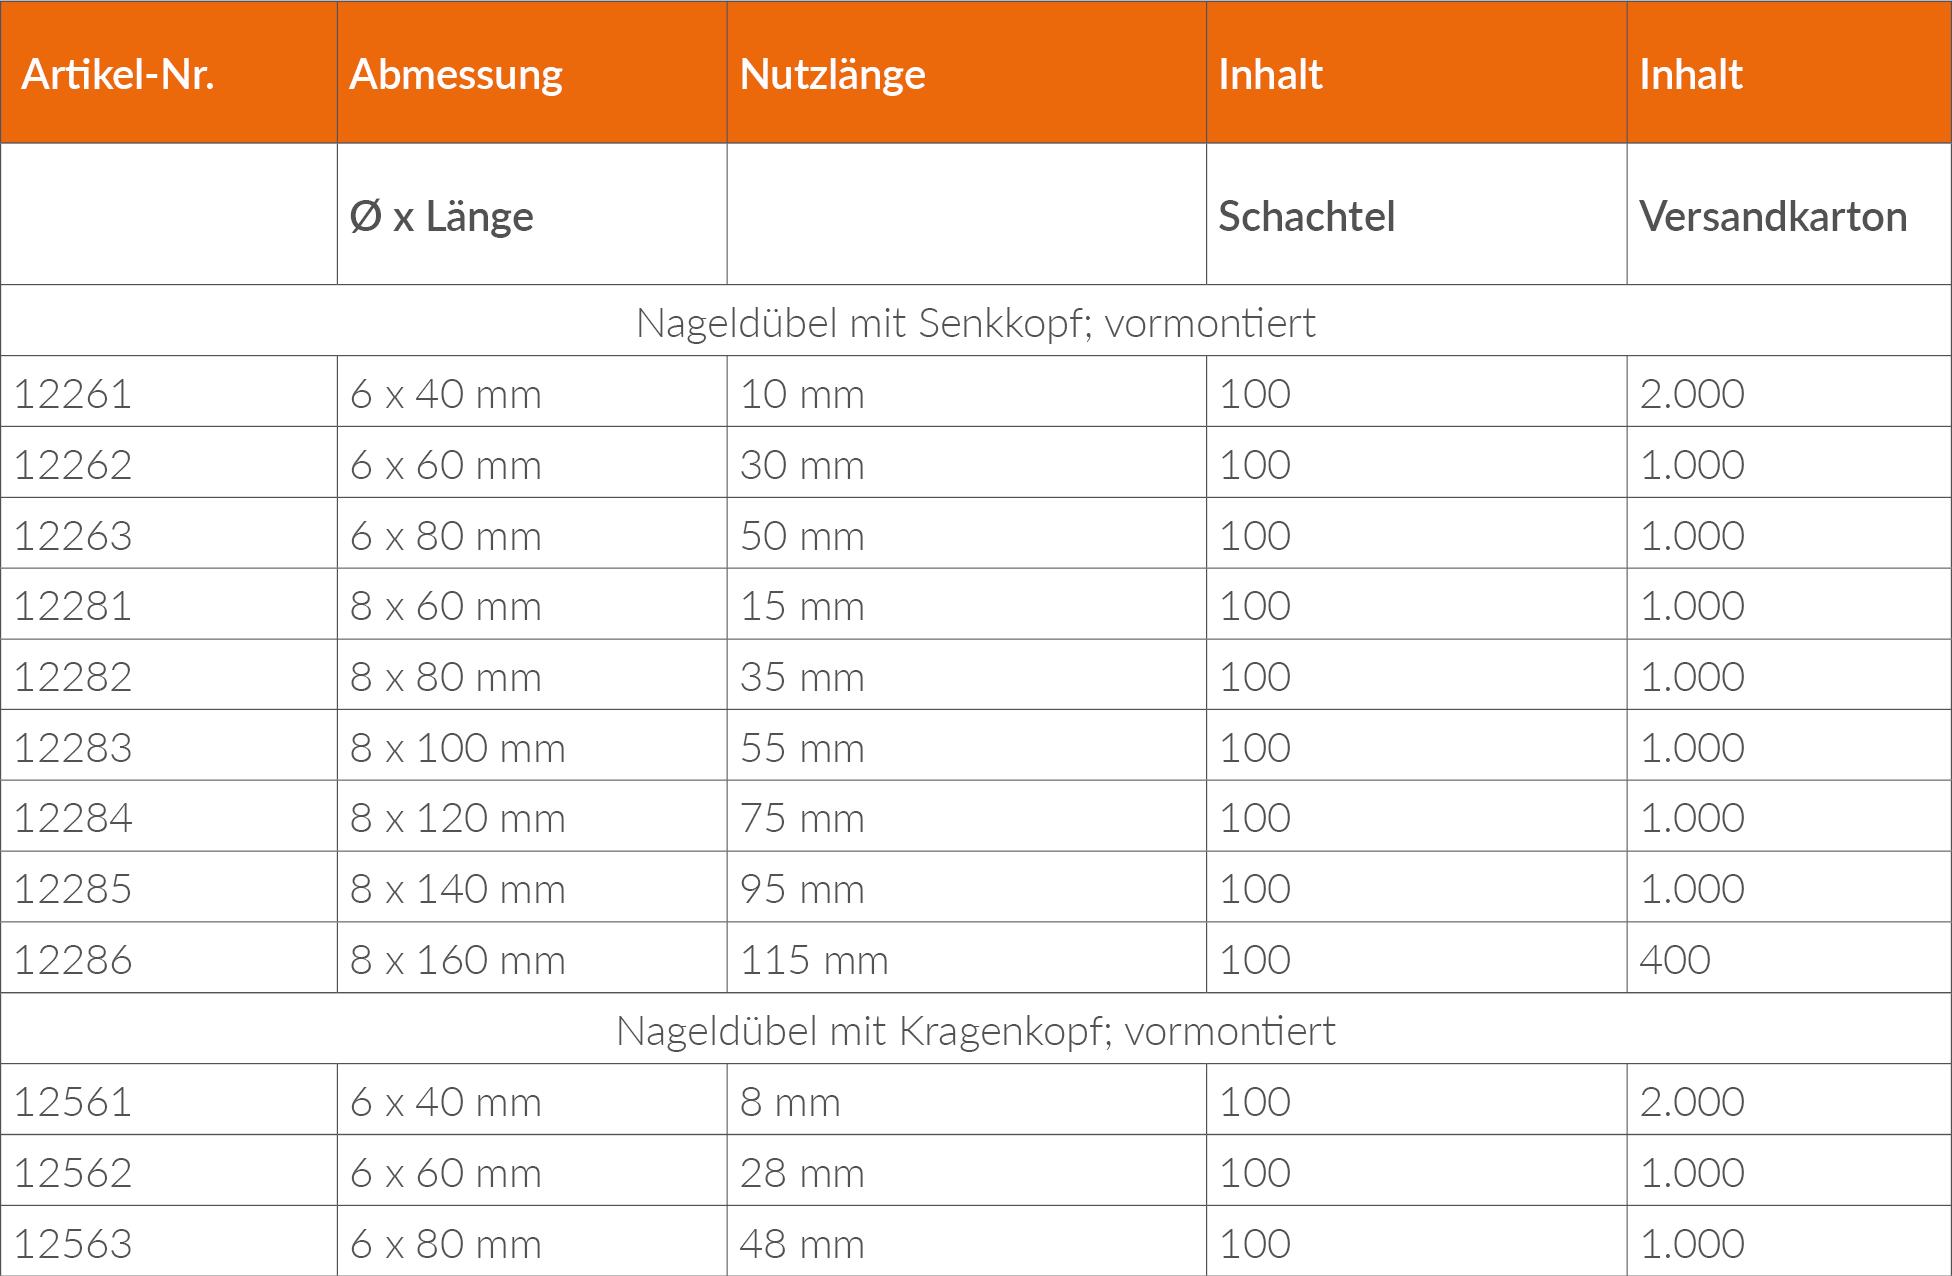 Lattungs-Nageldübel_Lieferprogramm